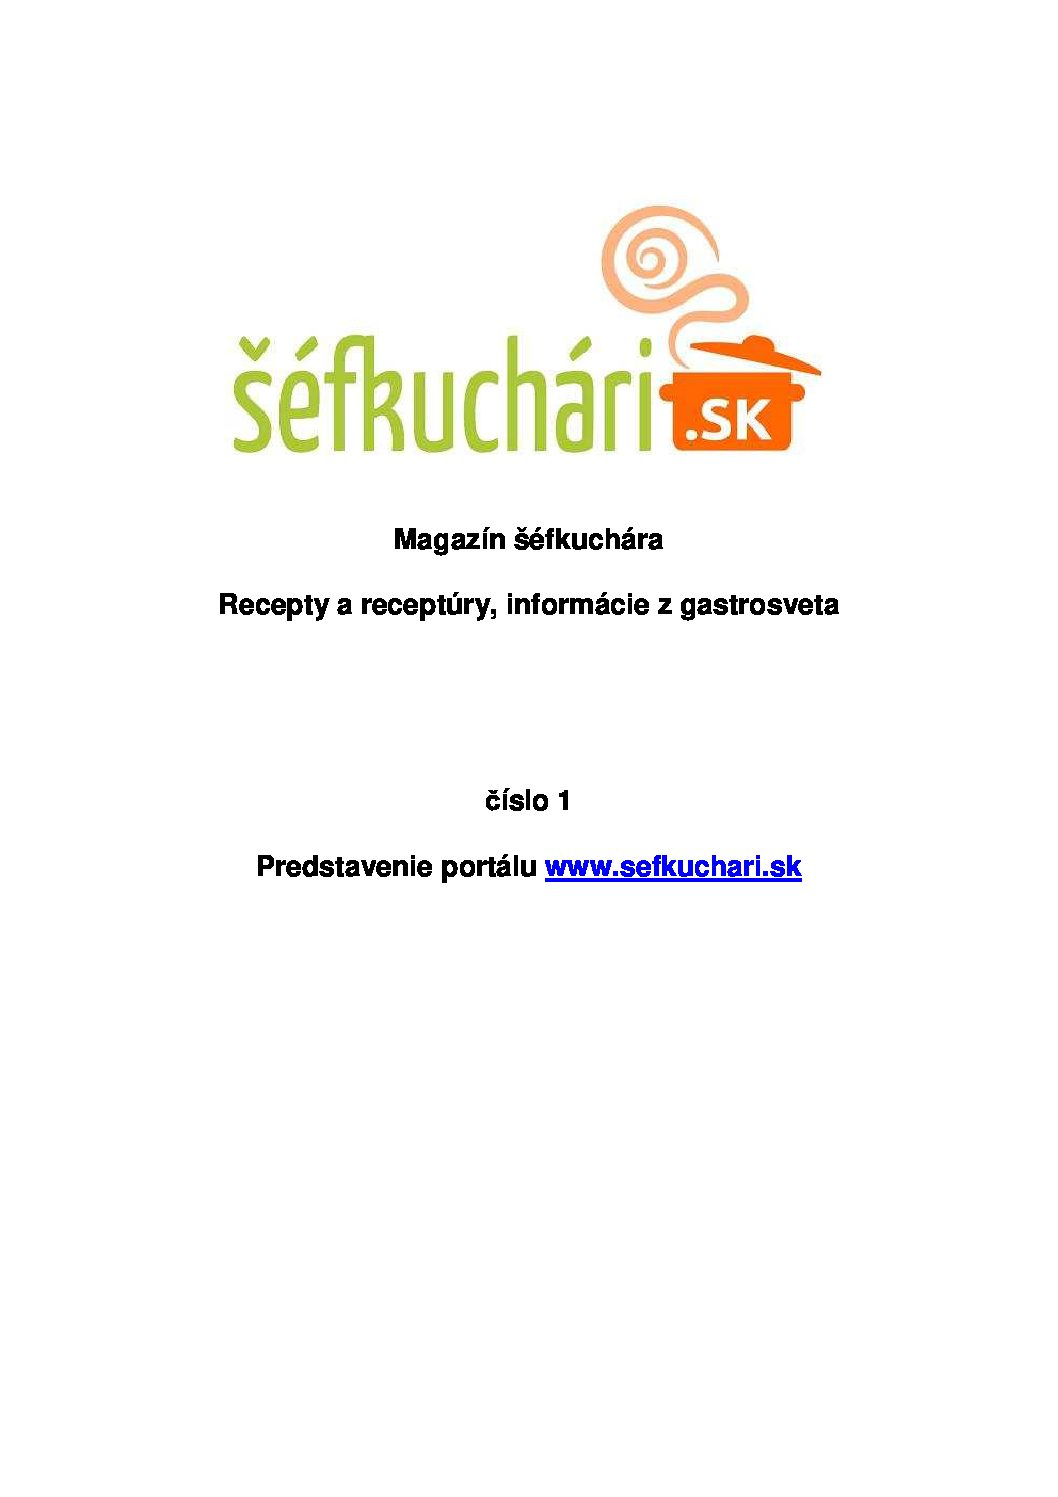 sfk 001 uvod pdf